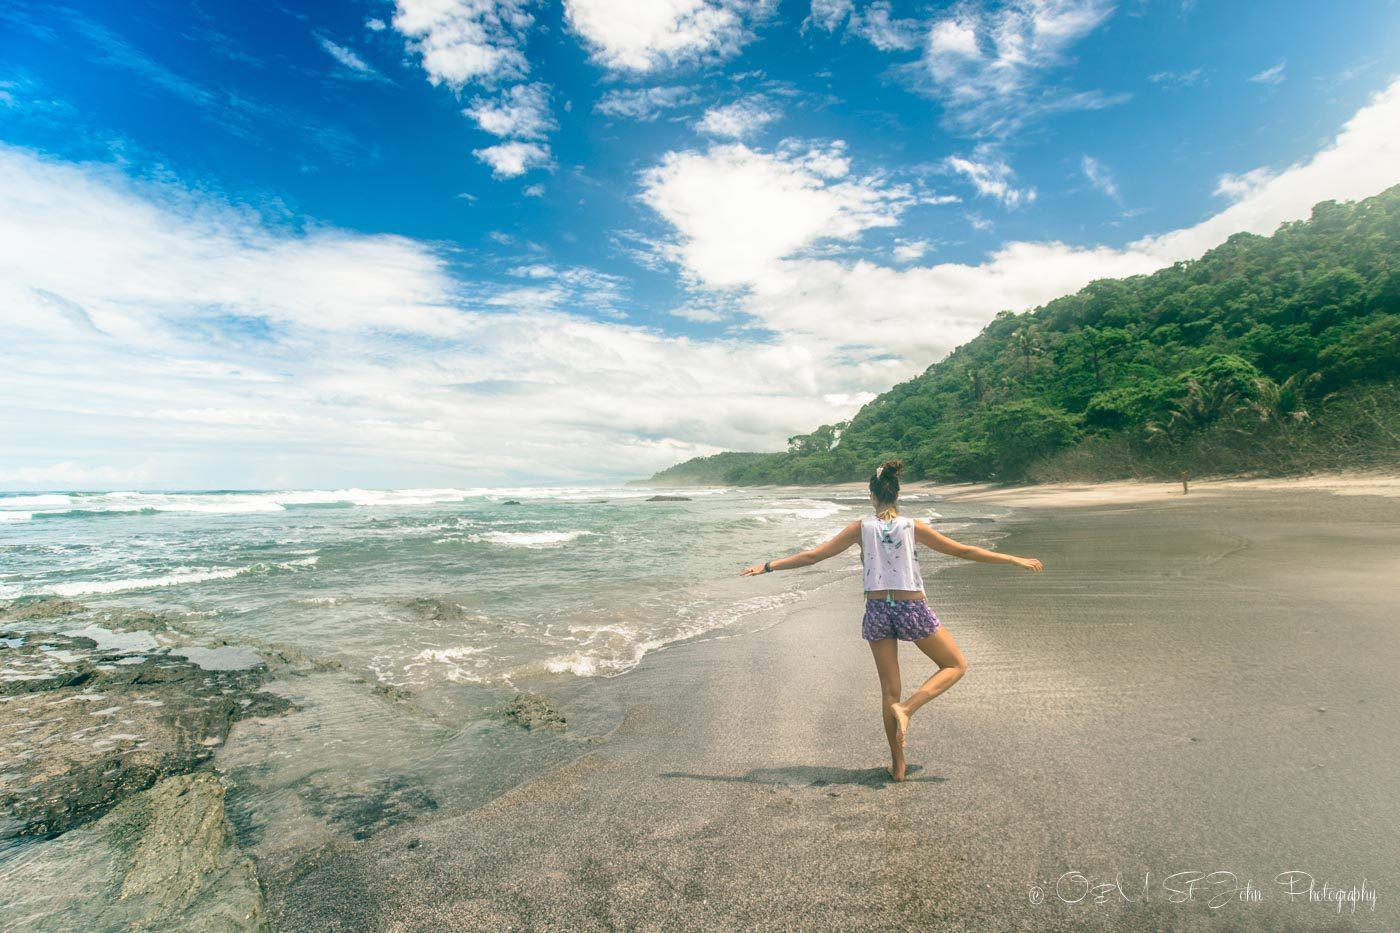 Oksana on the beach at Santa Teresa, Costa Rica